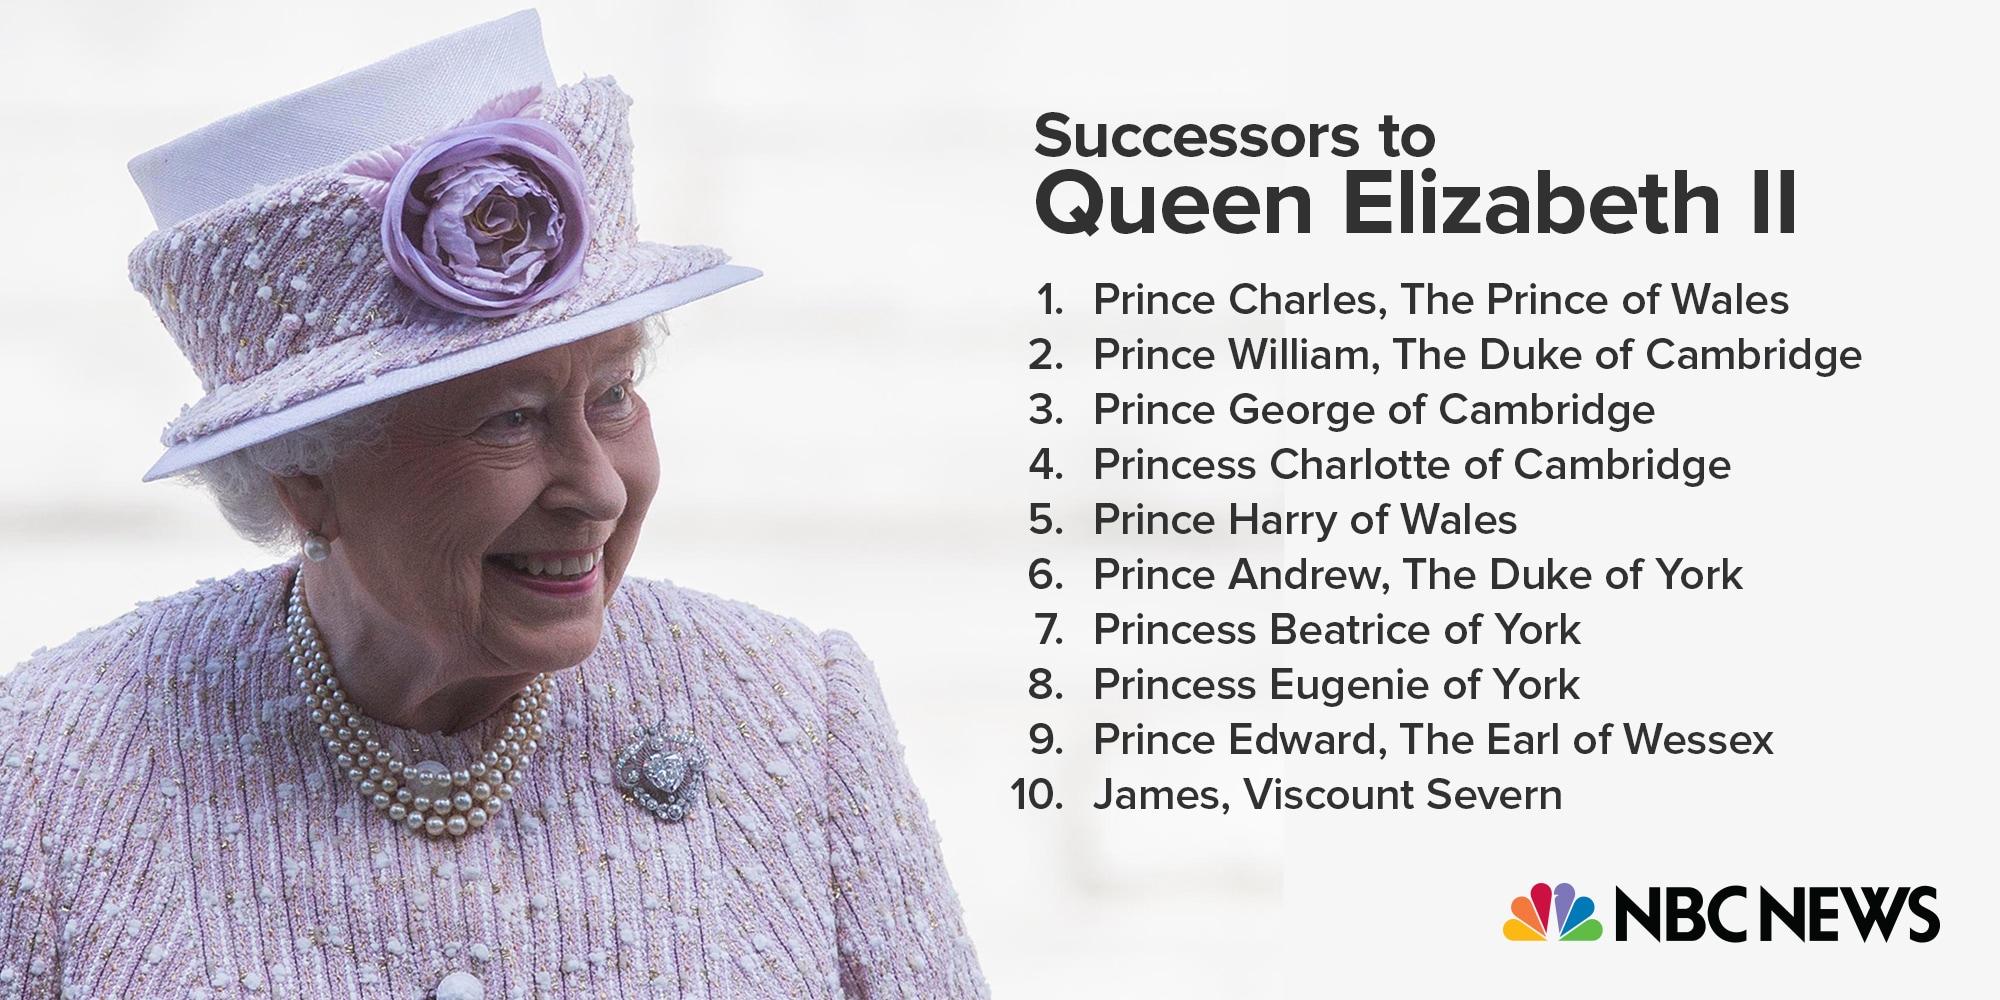 Queen Elizabeth Ii Marks 65 Years On Britain S Throne